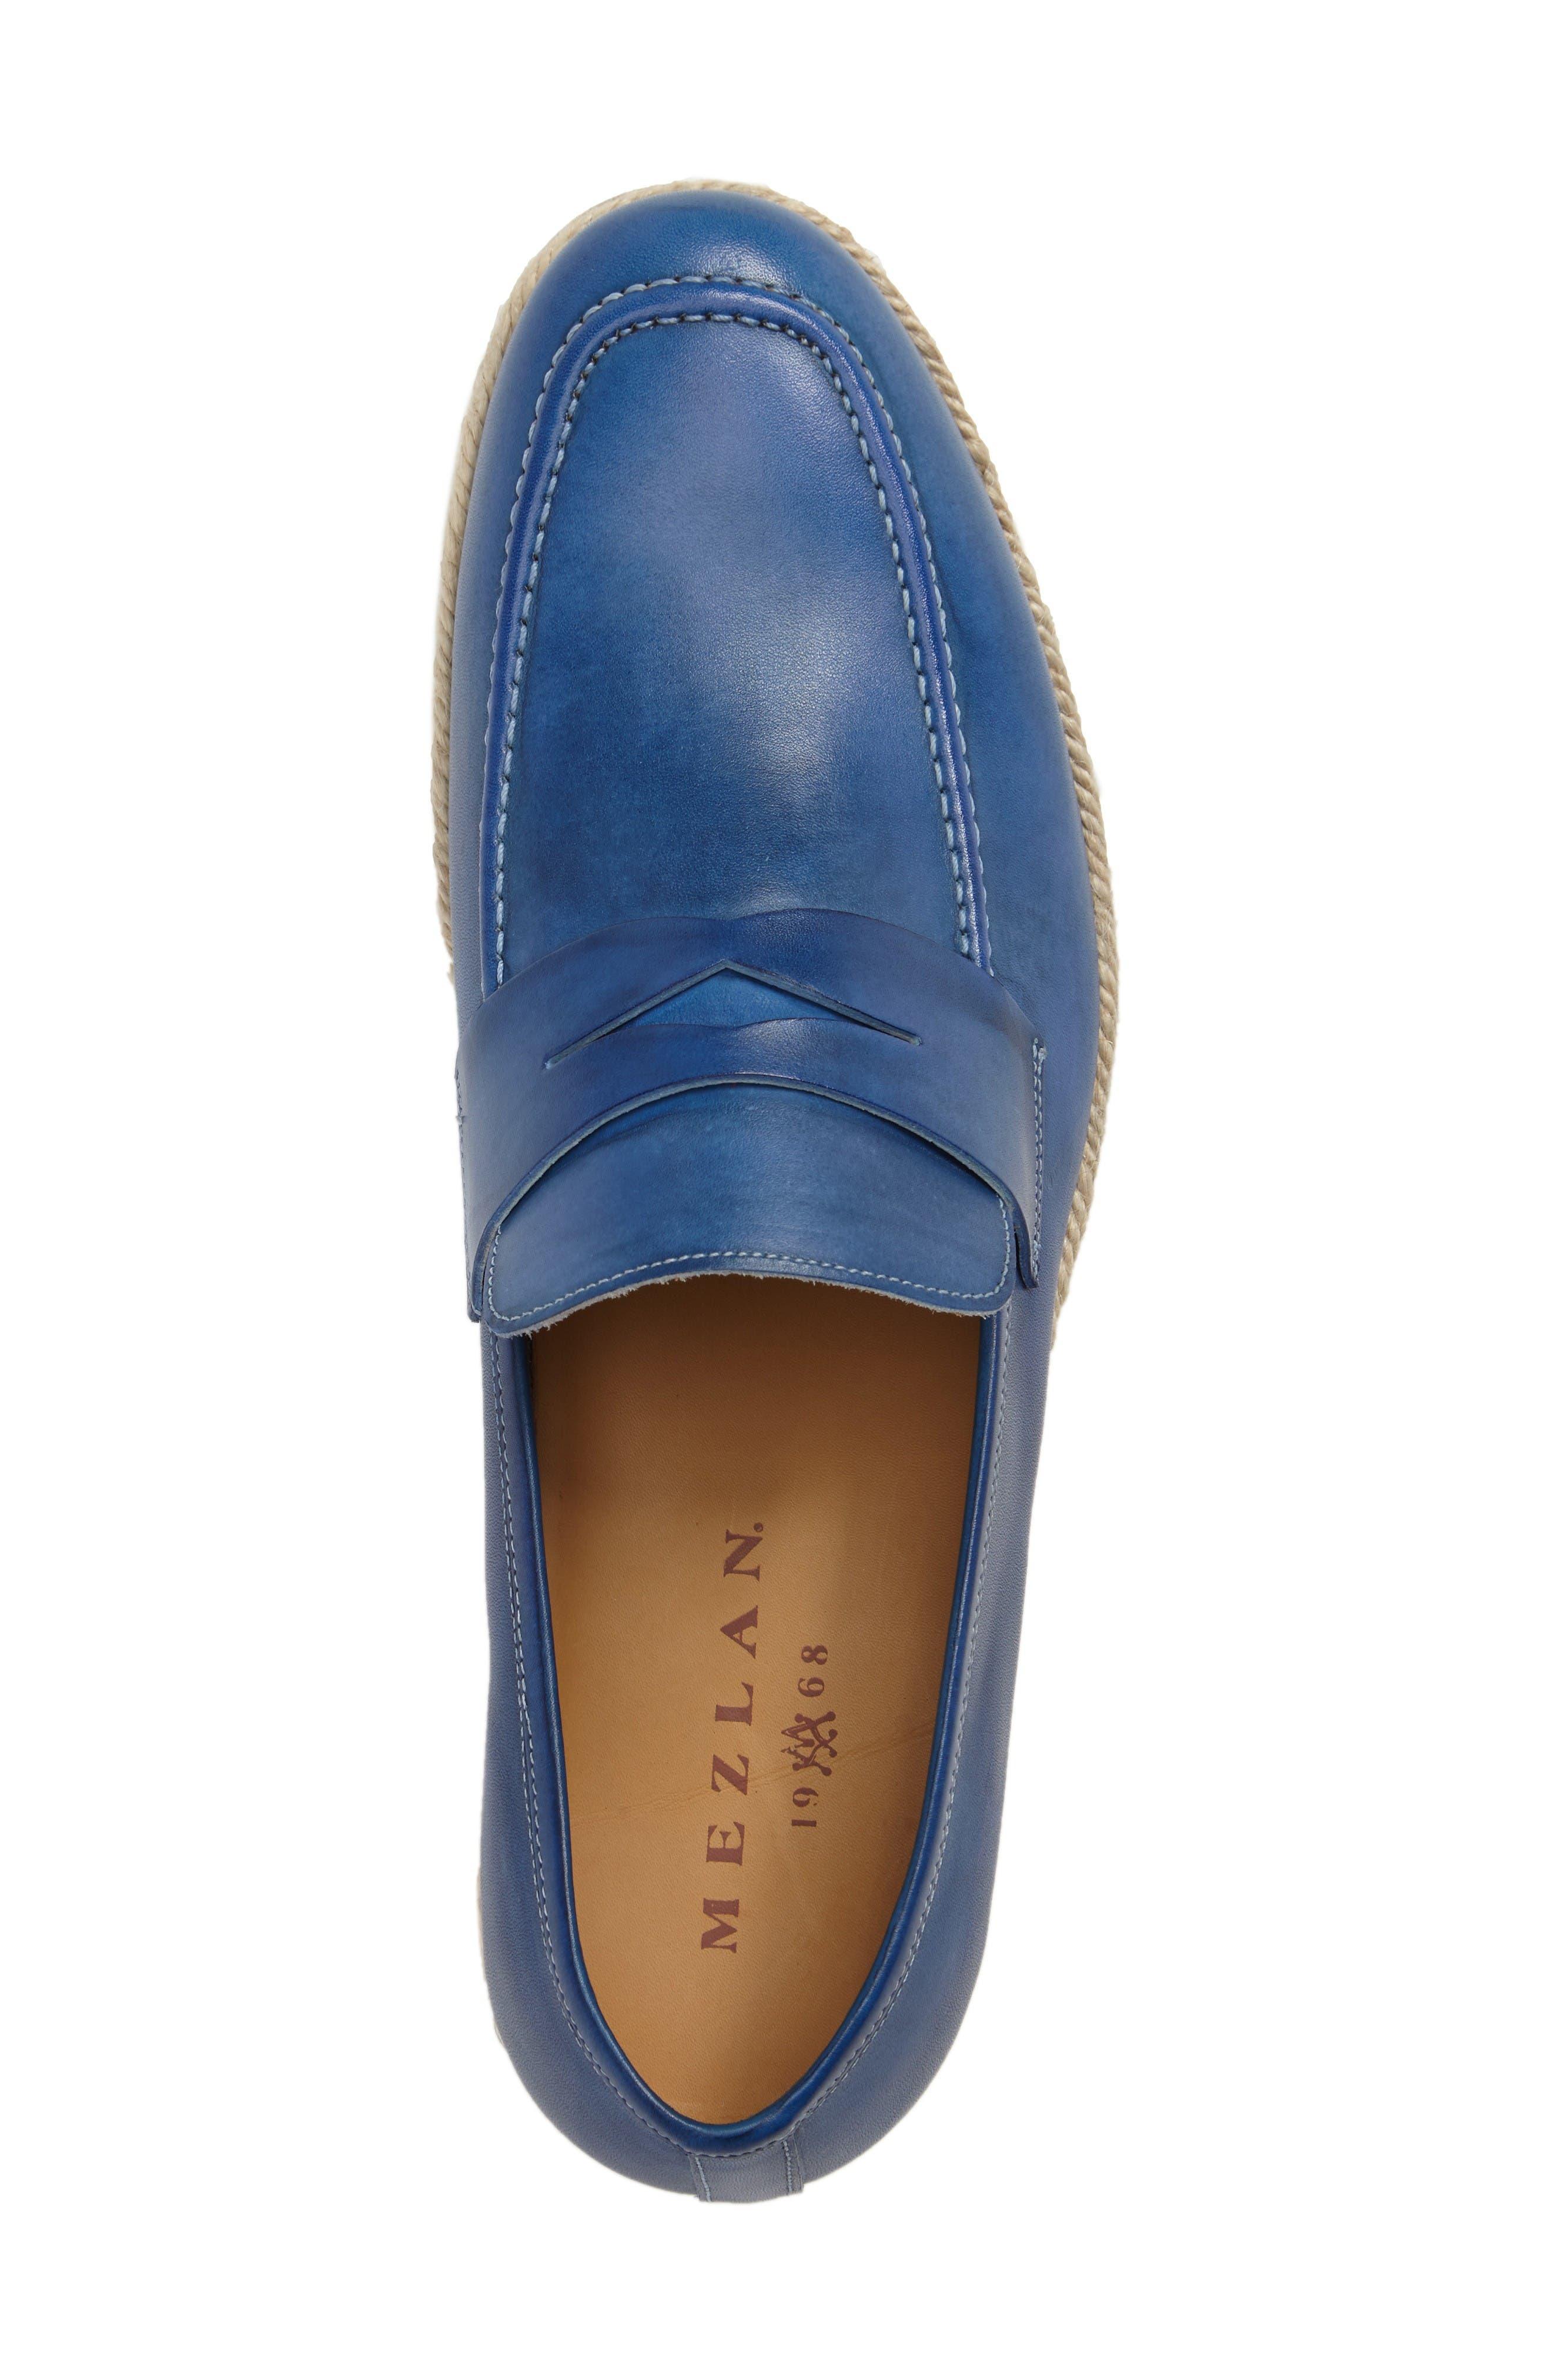 Battani Penny Loafer,                             Alternate thumbnail 5, color,                             Blue Leather